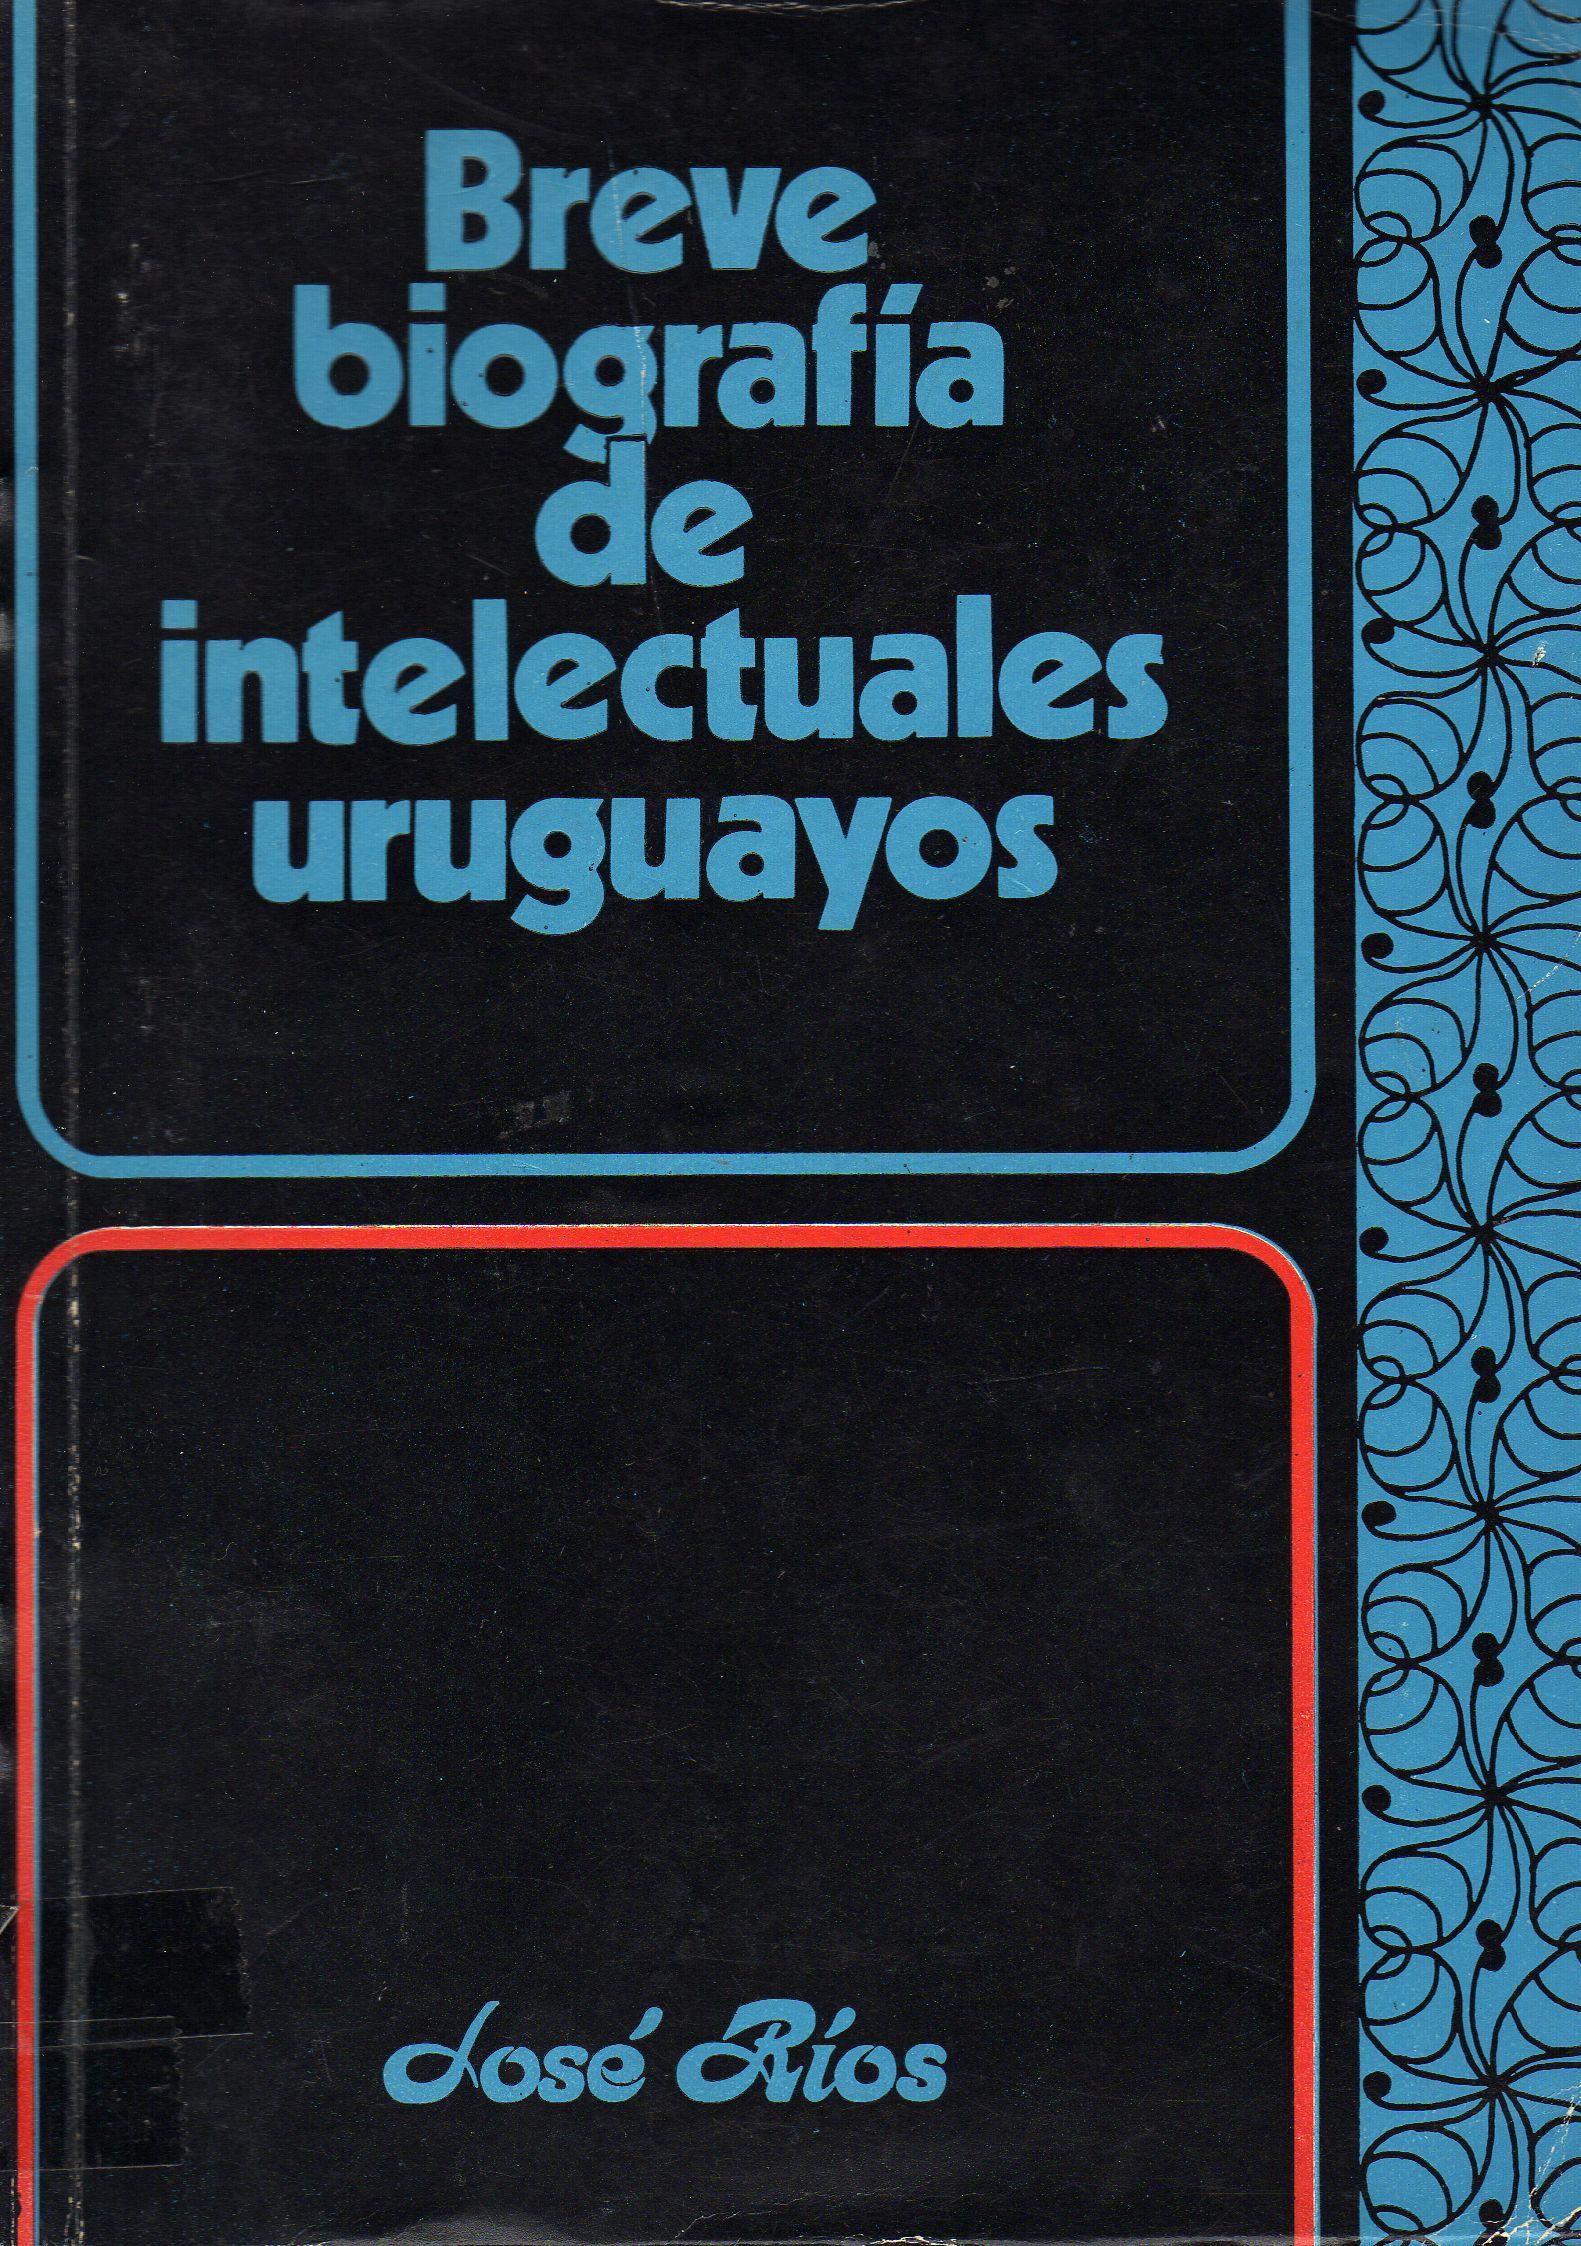 Breve biografia de intelectuales uruguayos